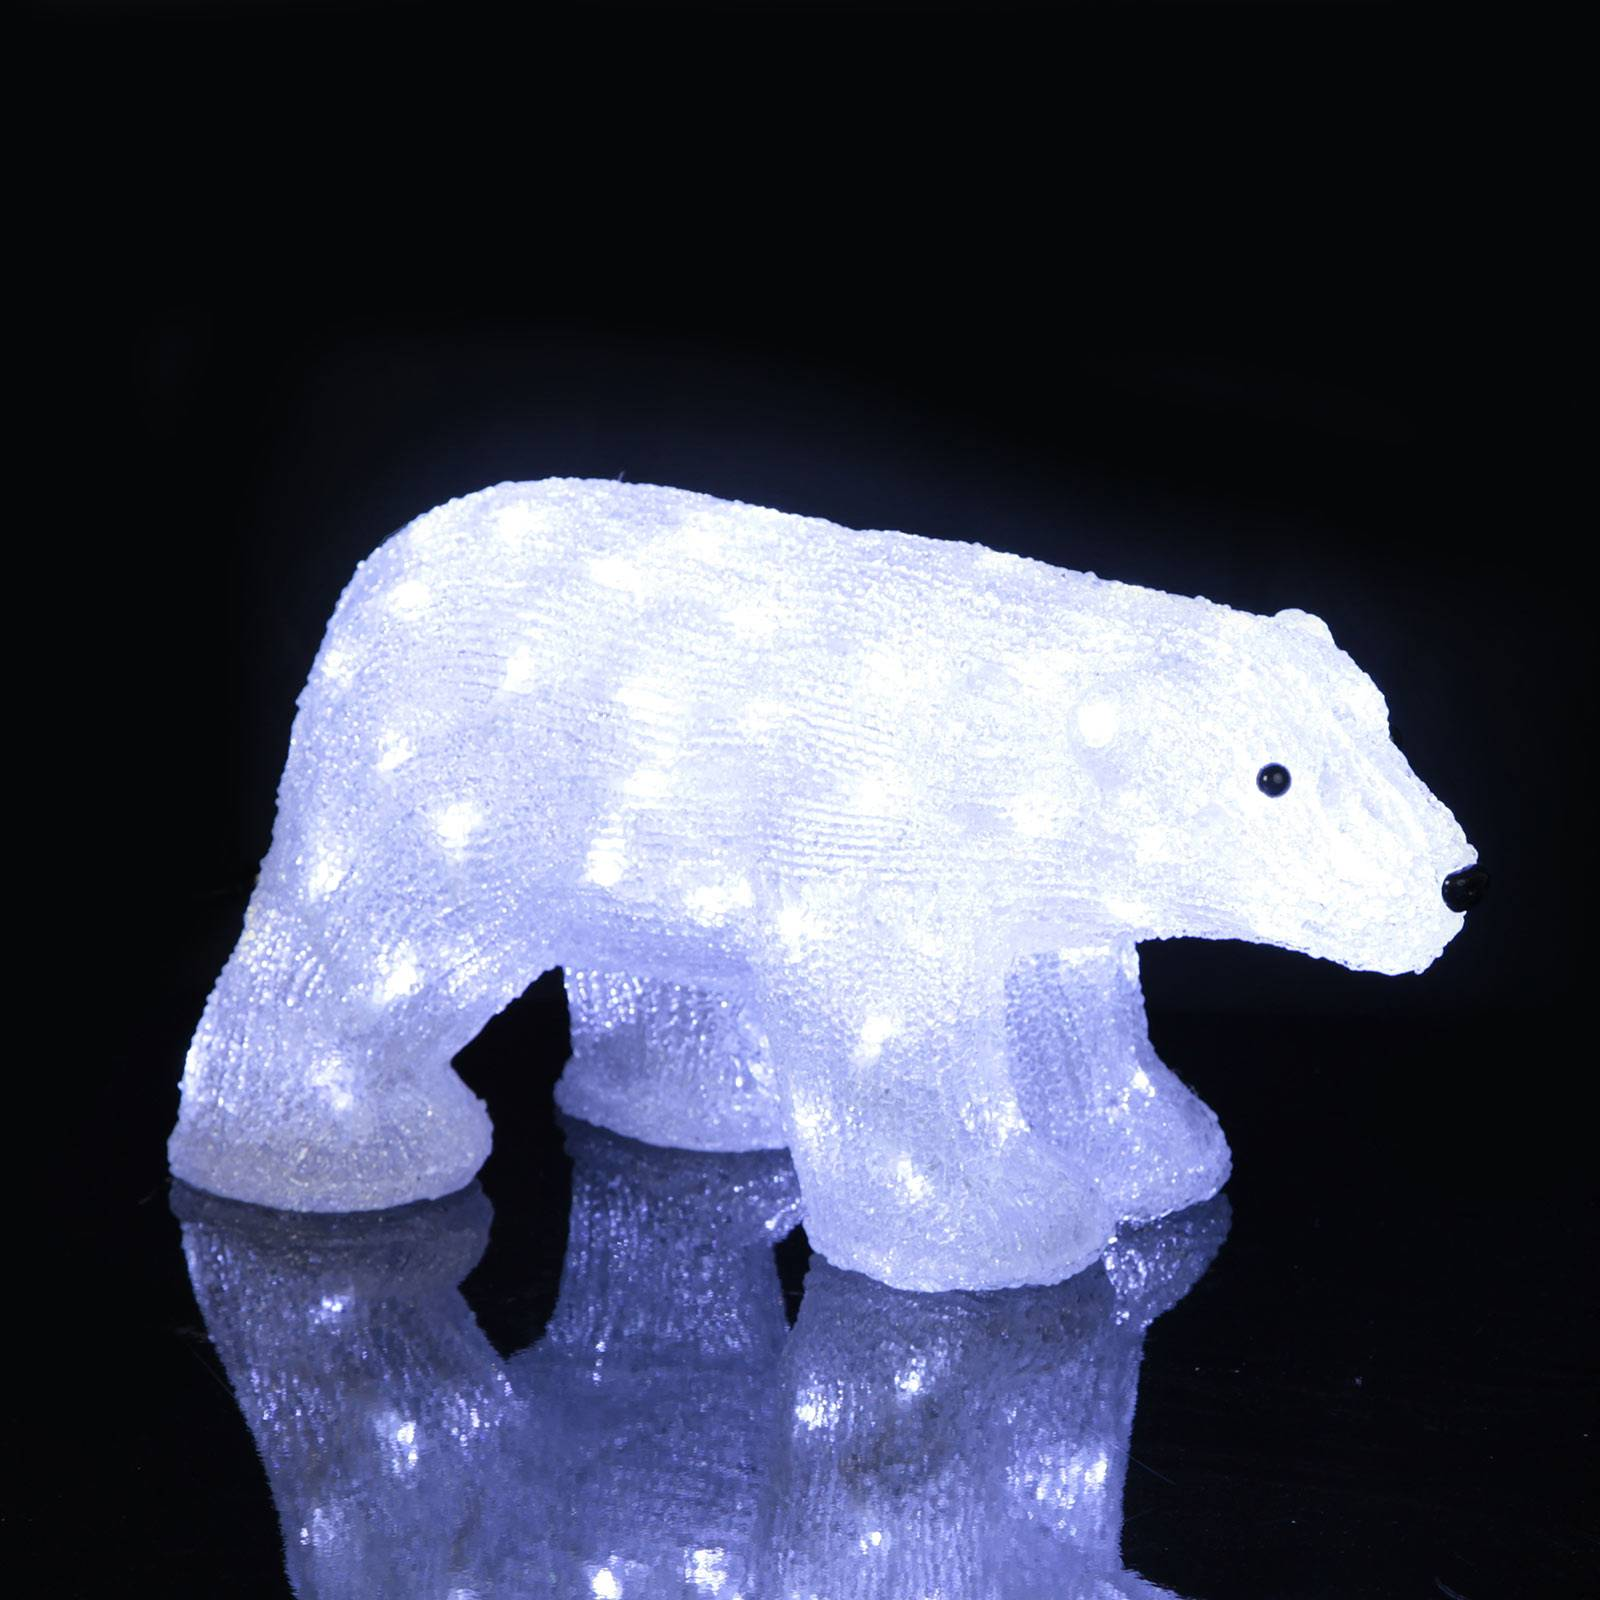 "*Merry X-Mas*: LED-Leuchtfigur ""Eisbär"" aus Acryl, klein (Kopie) Lampenwelt"